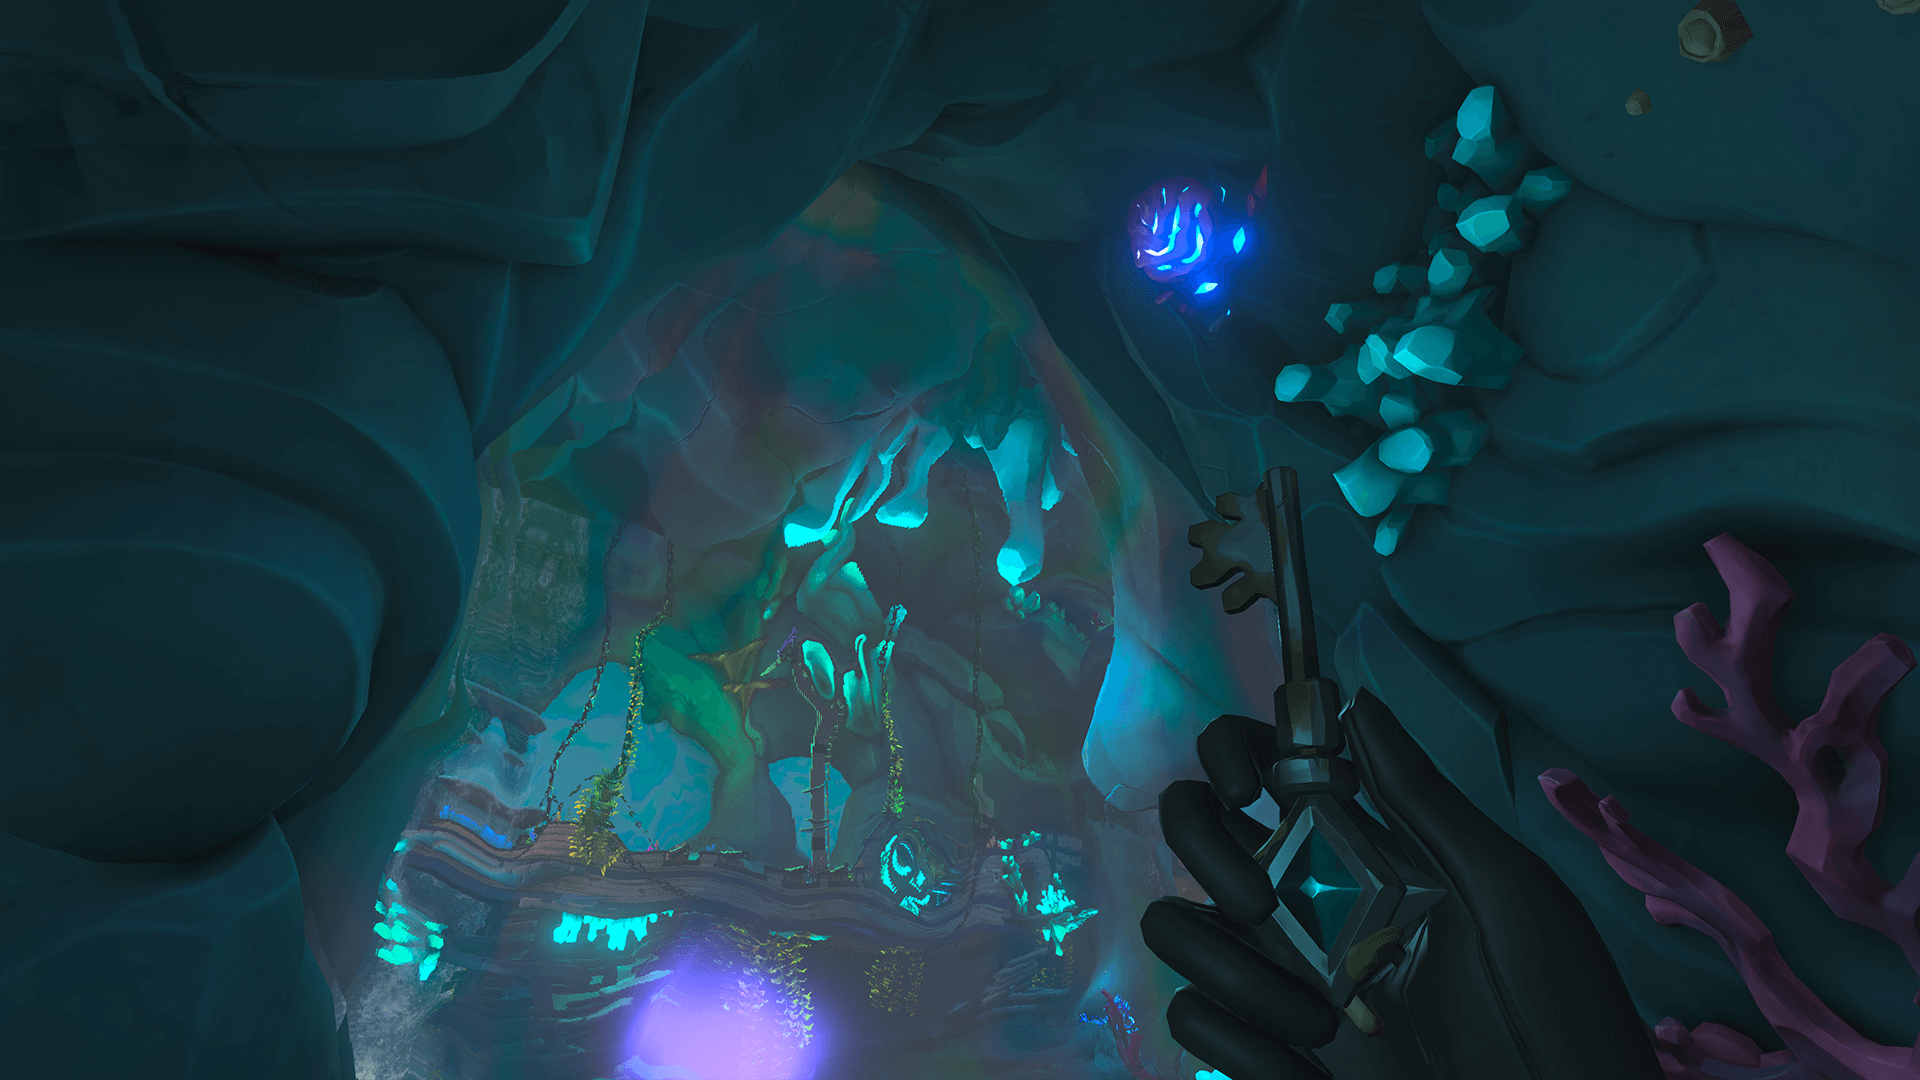 Entering Citadel Cavern 4